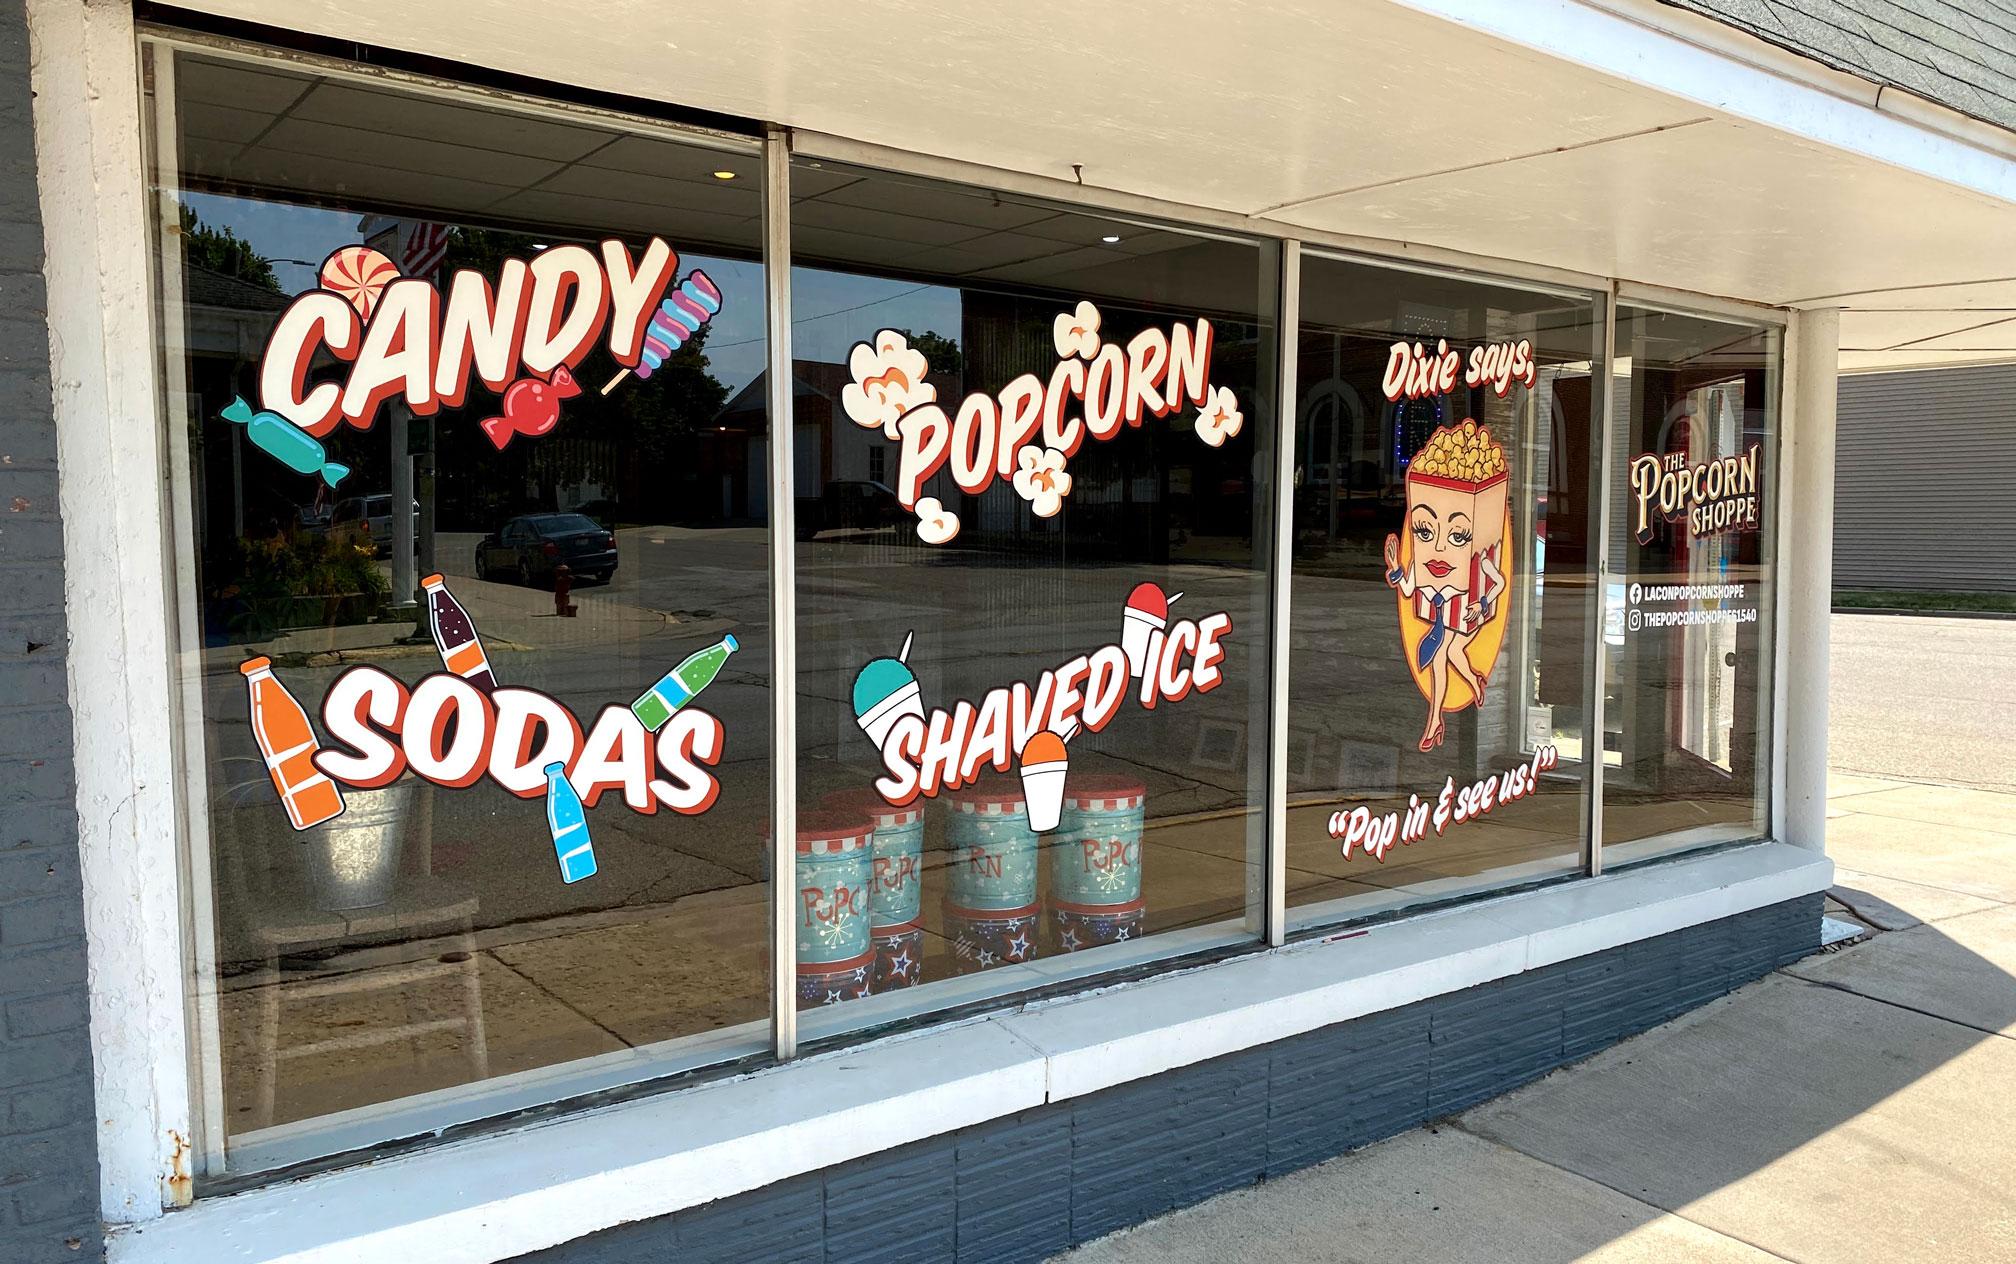 The Popcorn Shoppe